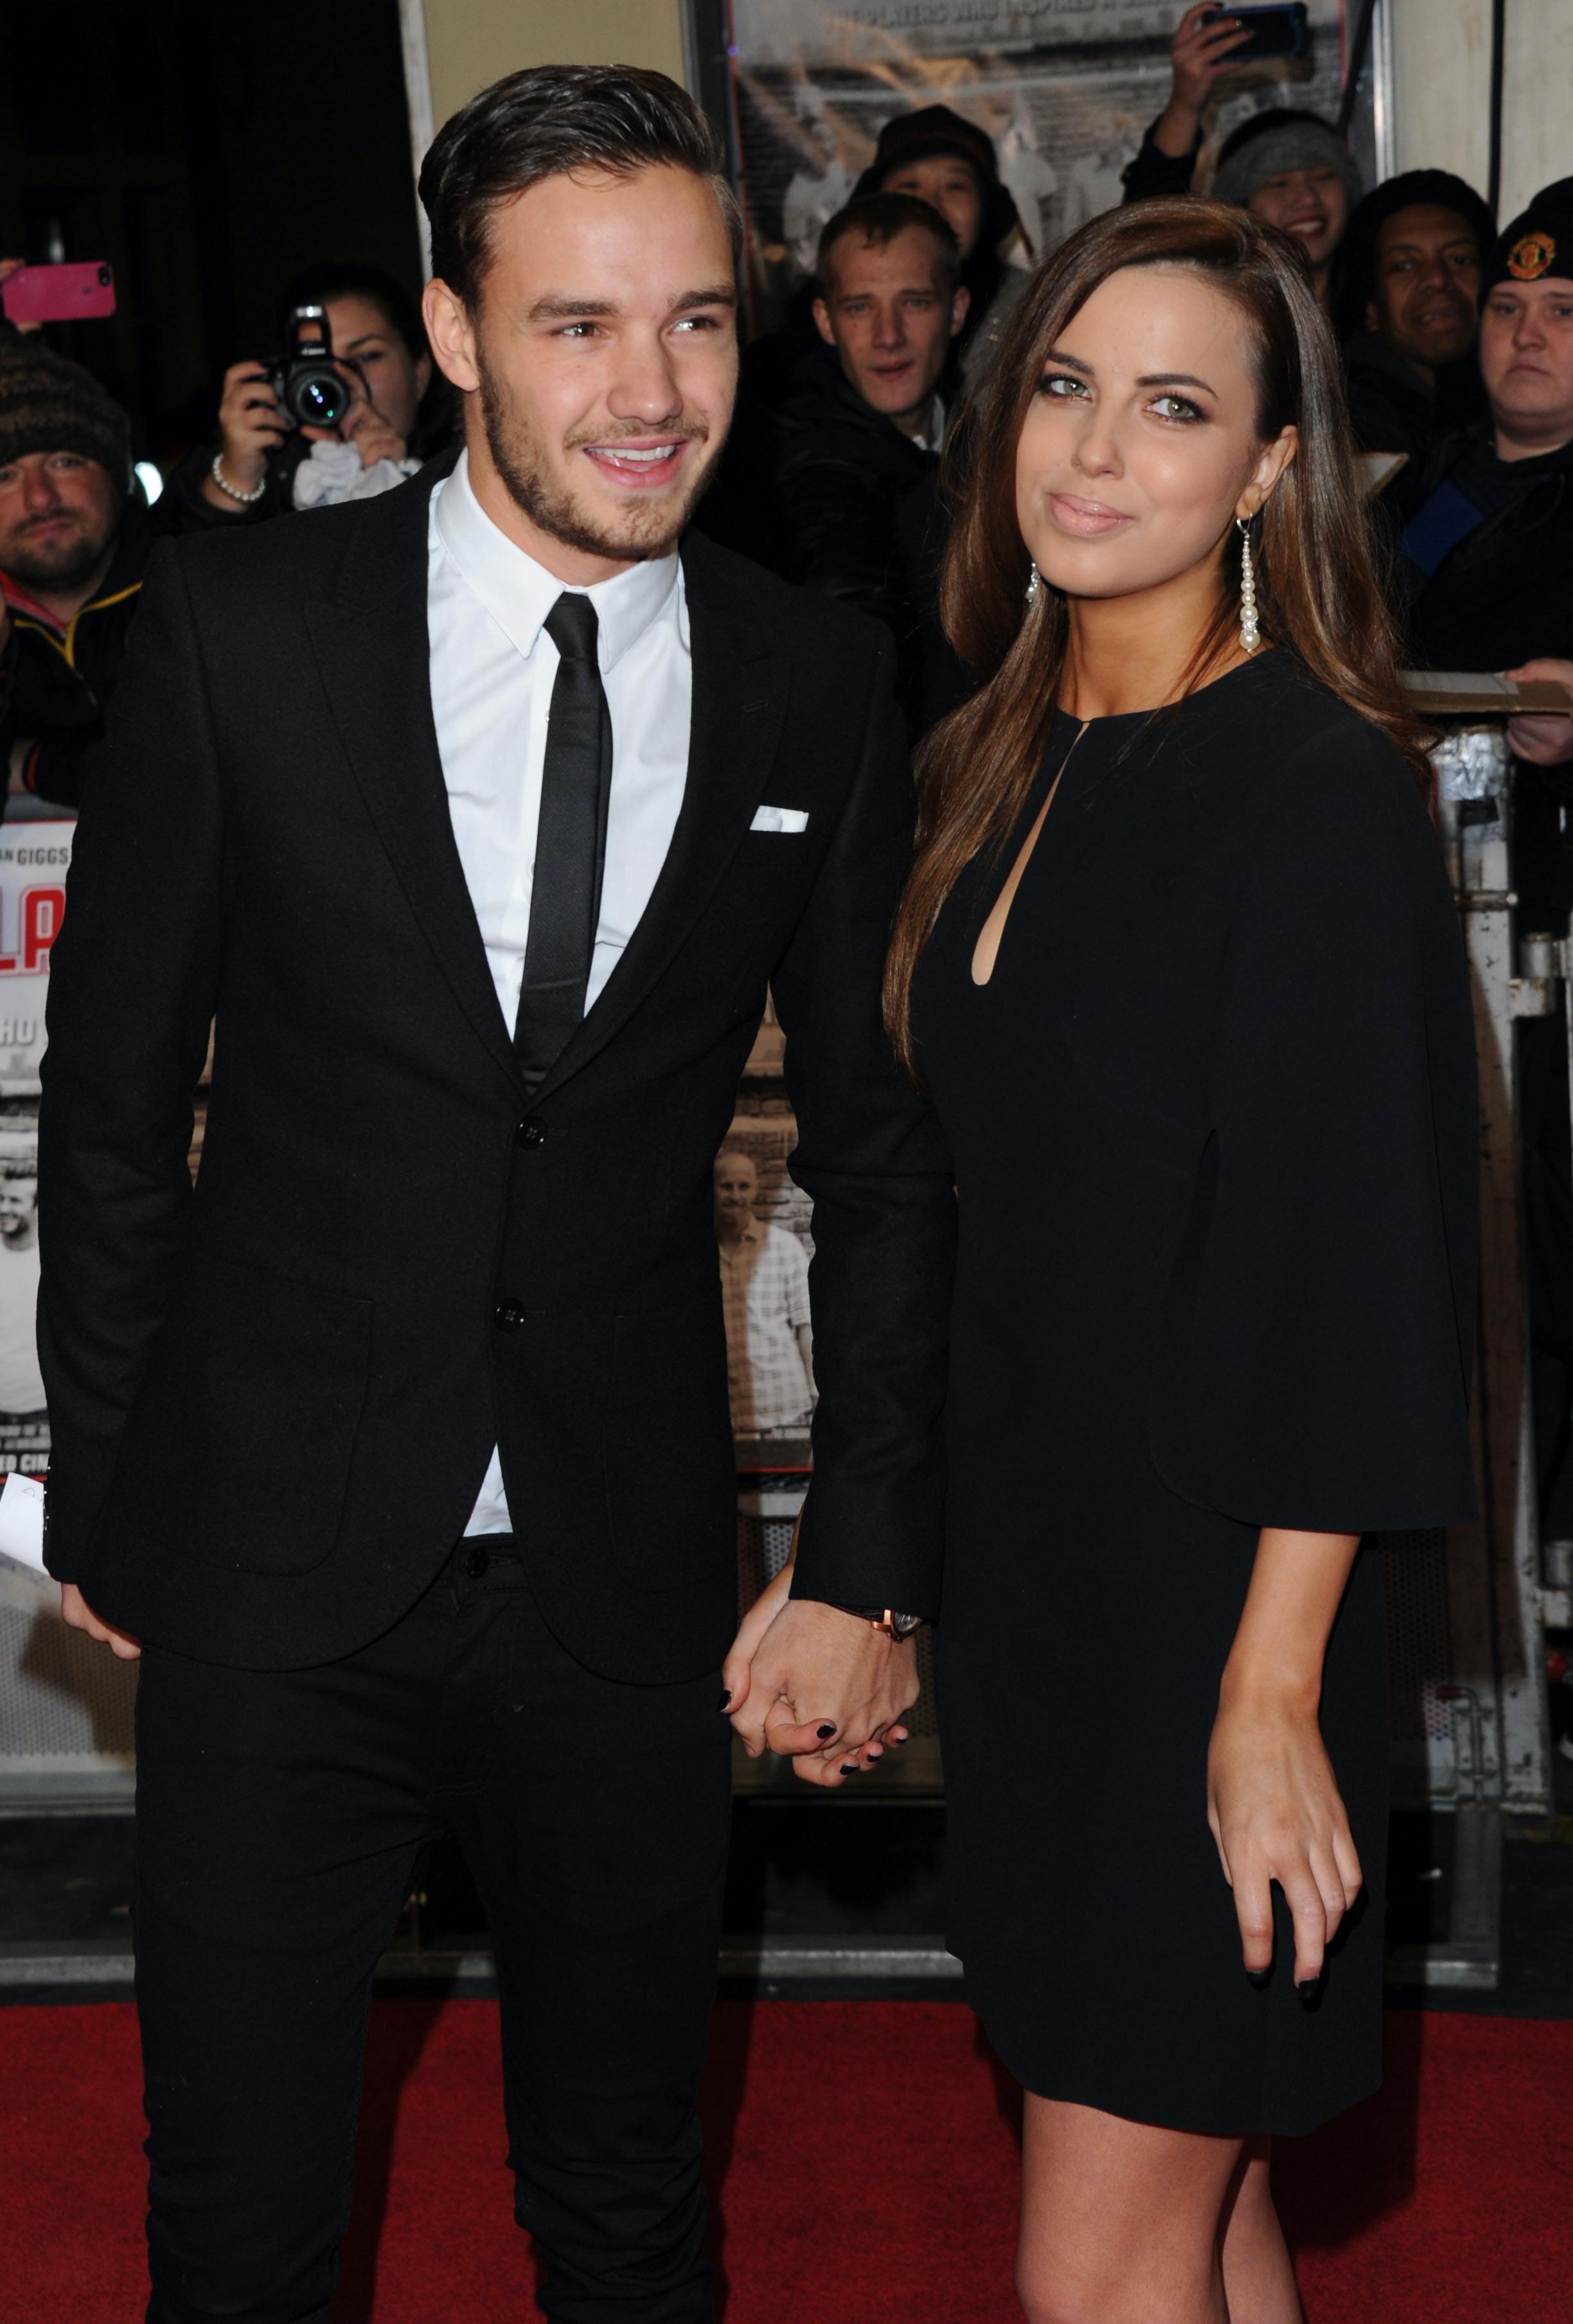 Sophia and Liam